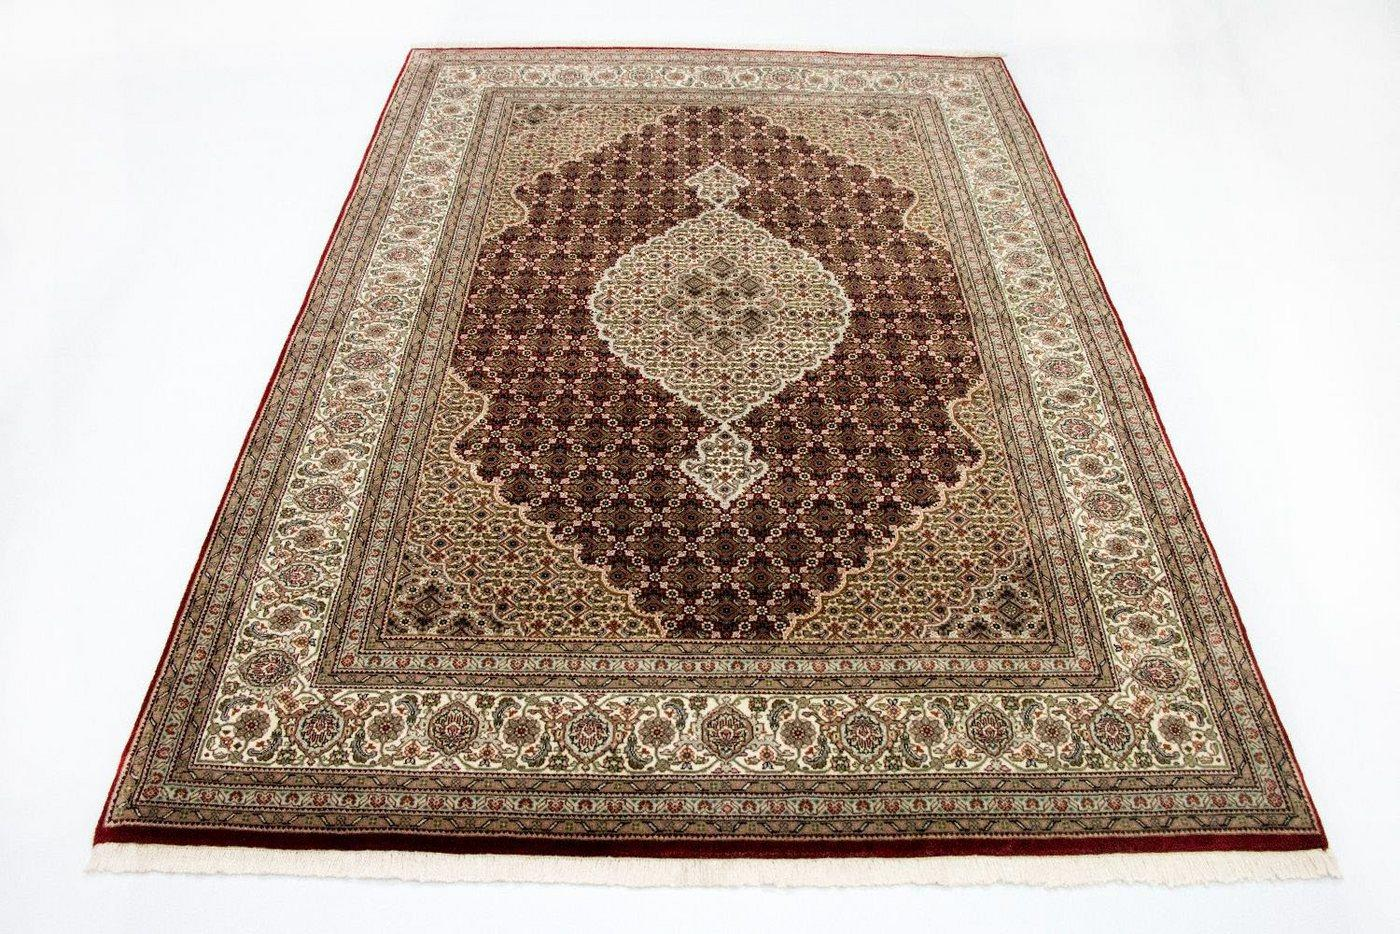 Teppich »Täbriz 50 Raj Teppich Mahi«, morgenland, rechteckig, Höhe 9 mm, rot